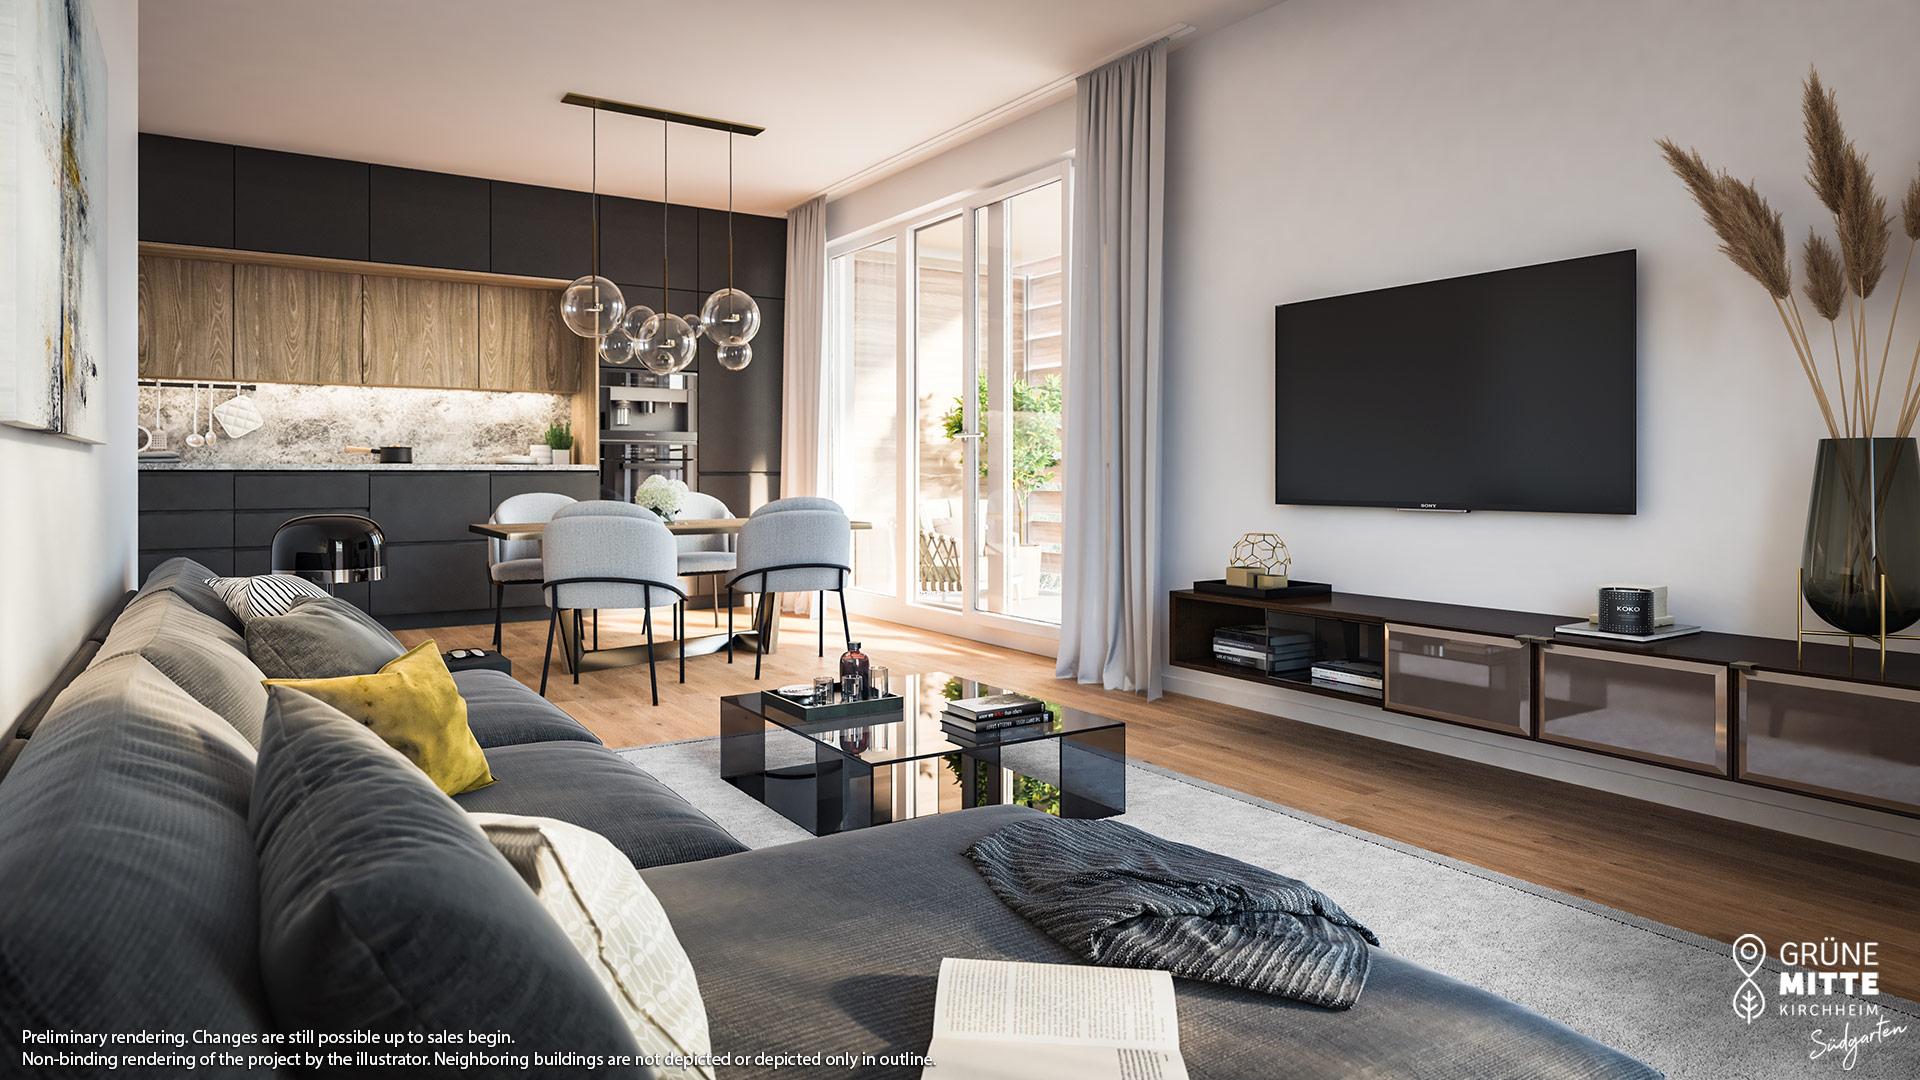 Property Gruene Mitte Kirchheim - Suedgarten - Preannouncement - Illustration 4